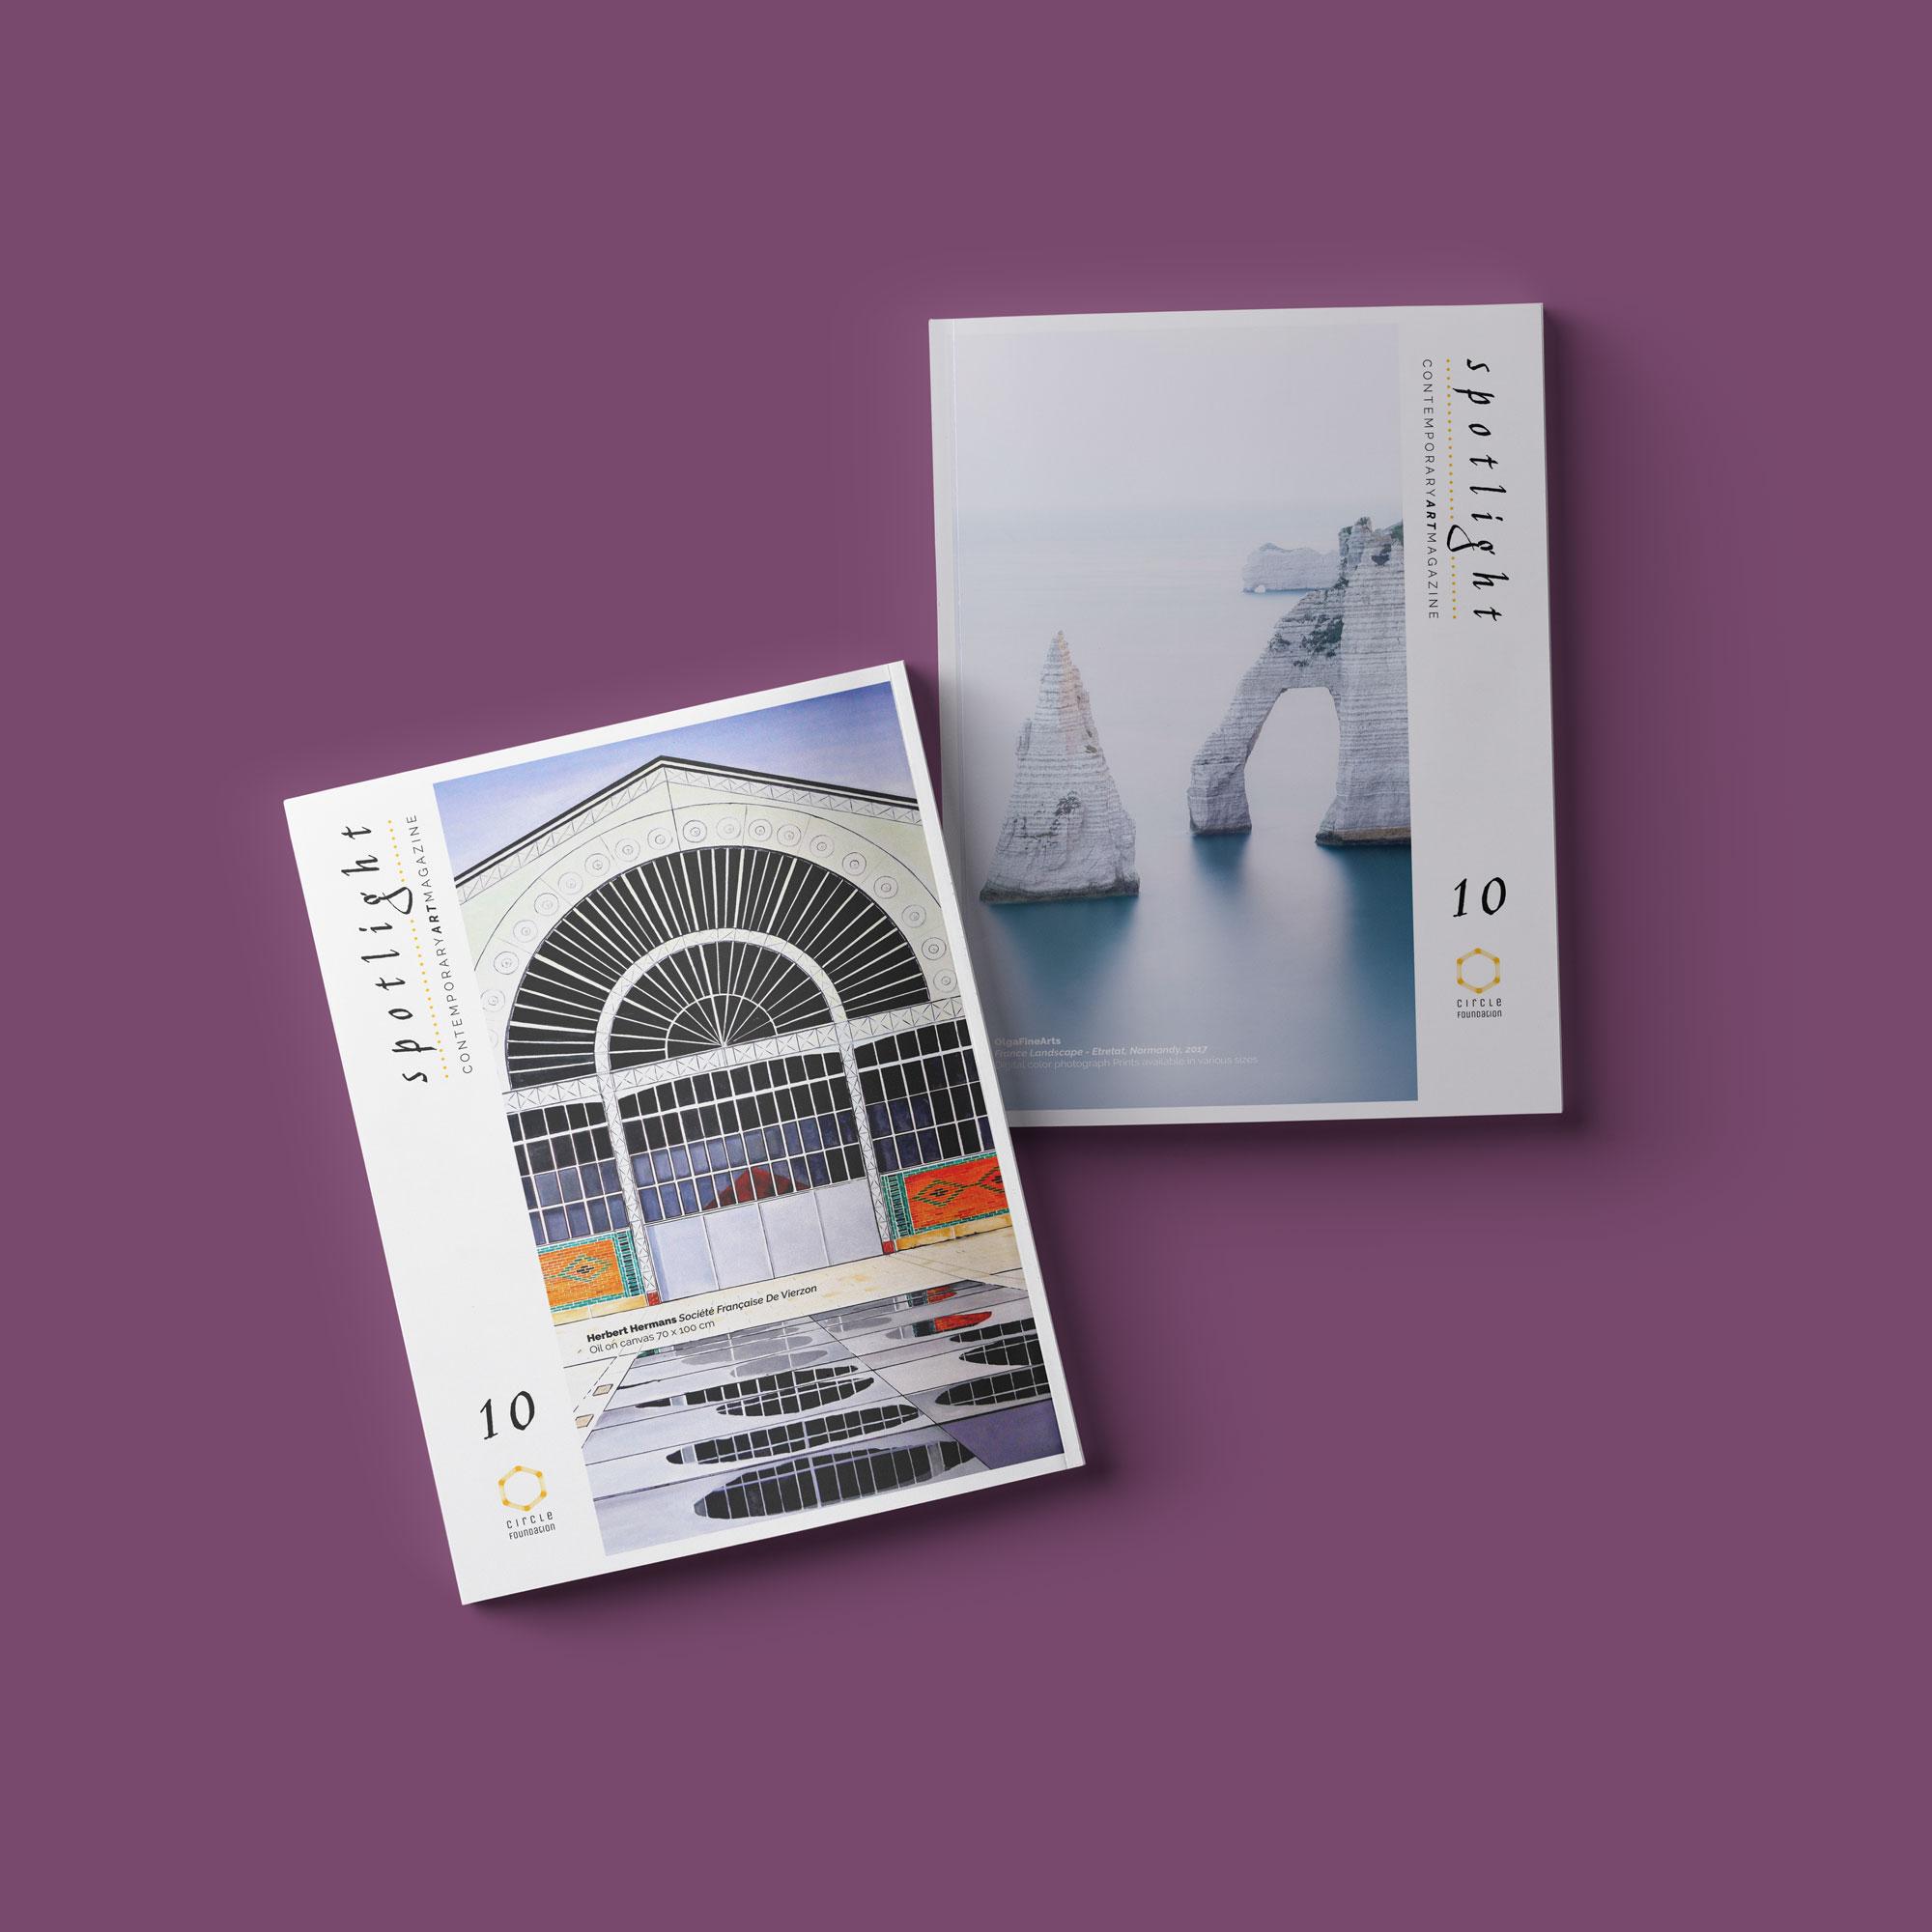 Spotlight Magazine - Issue 10